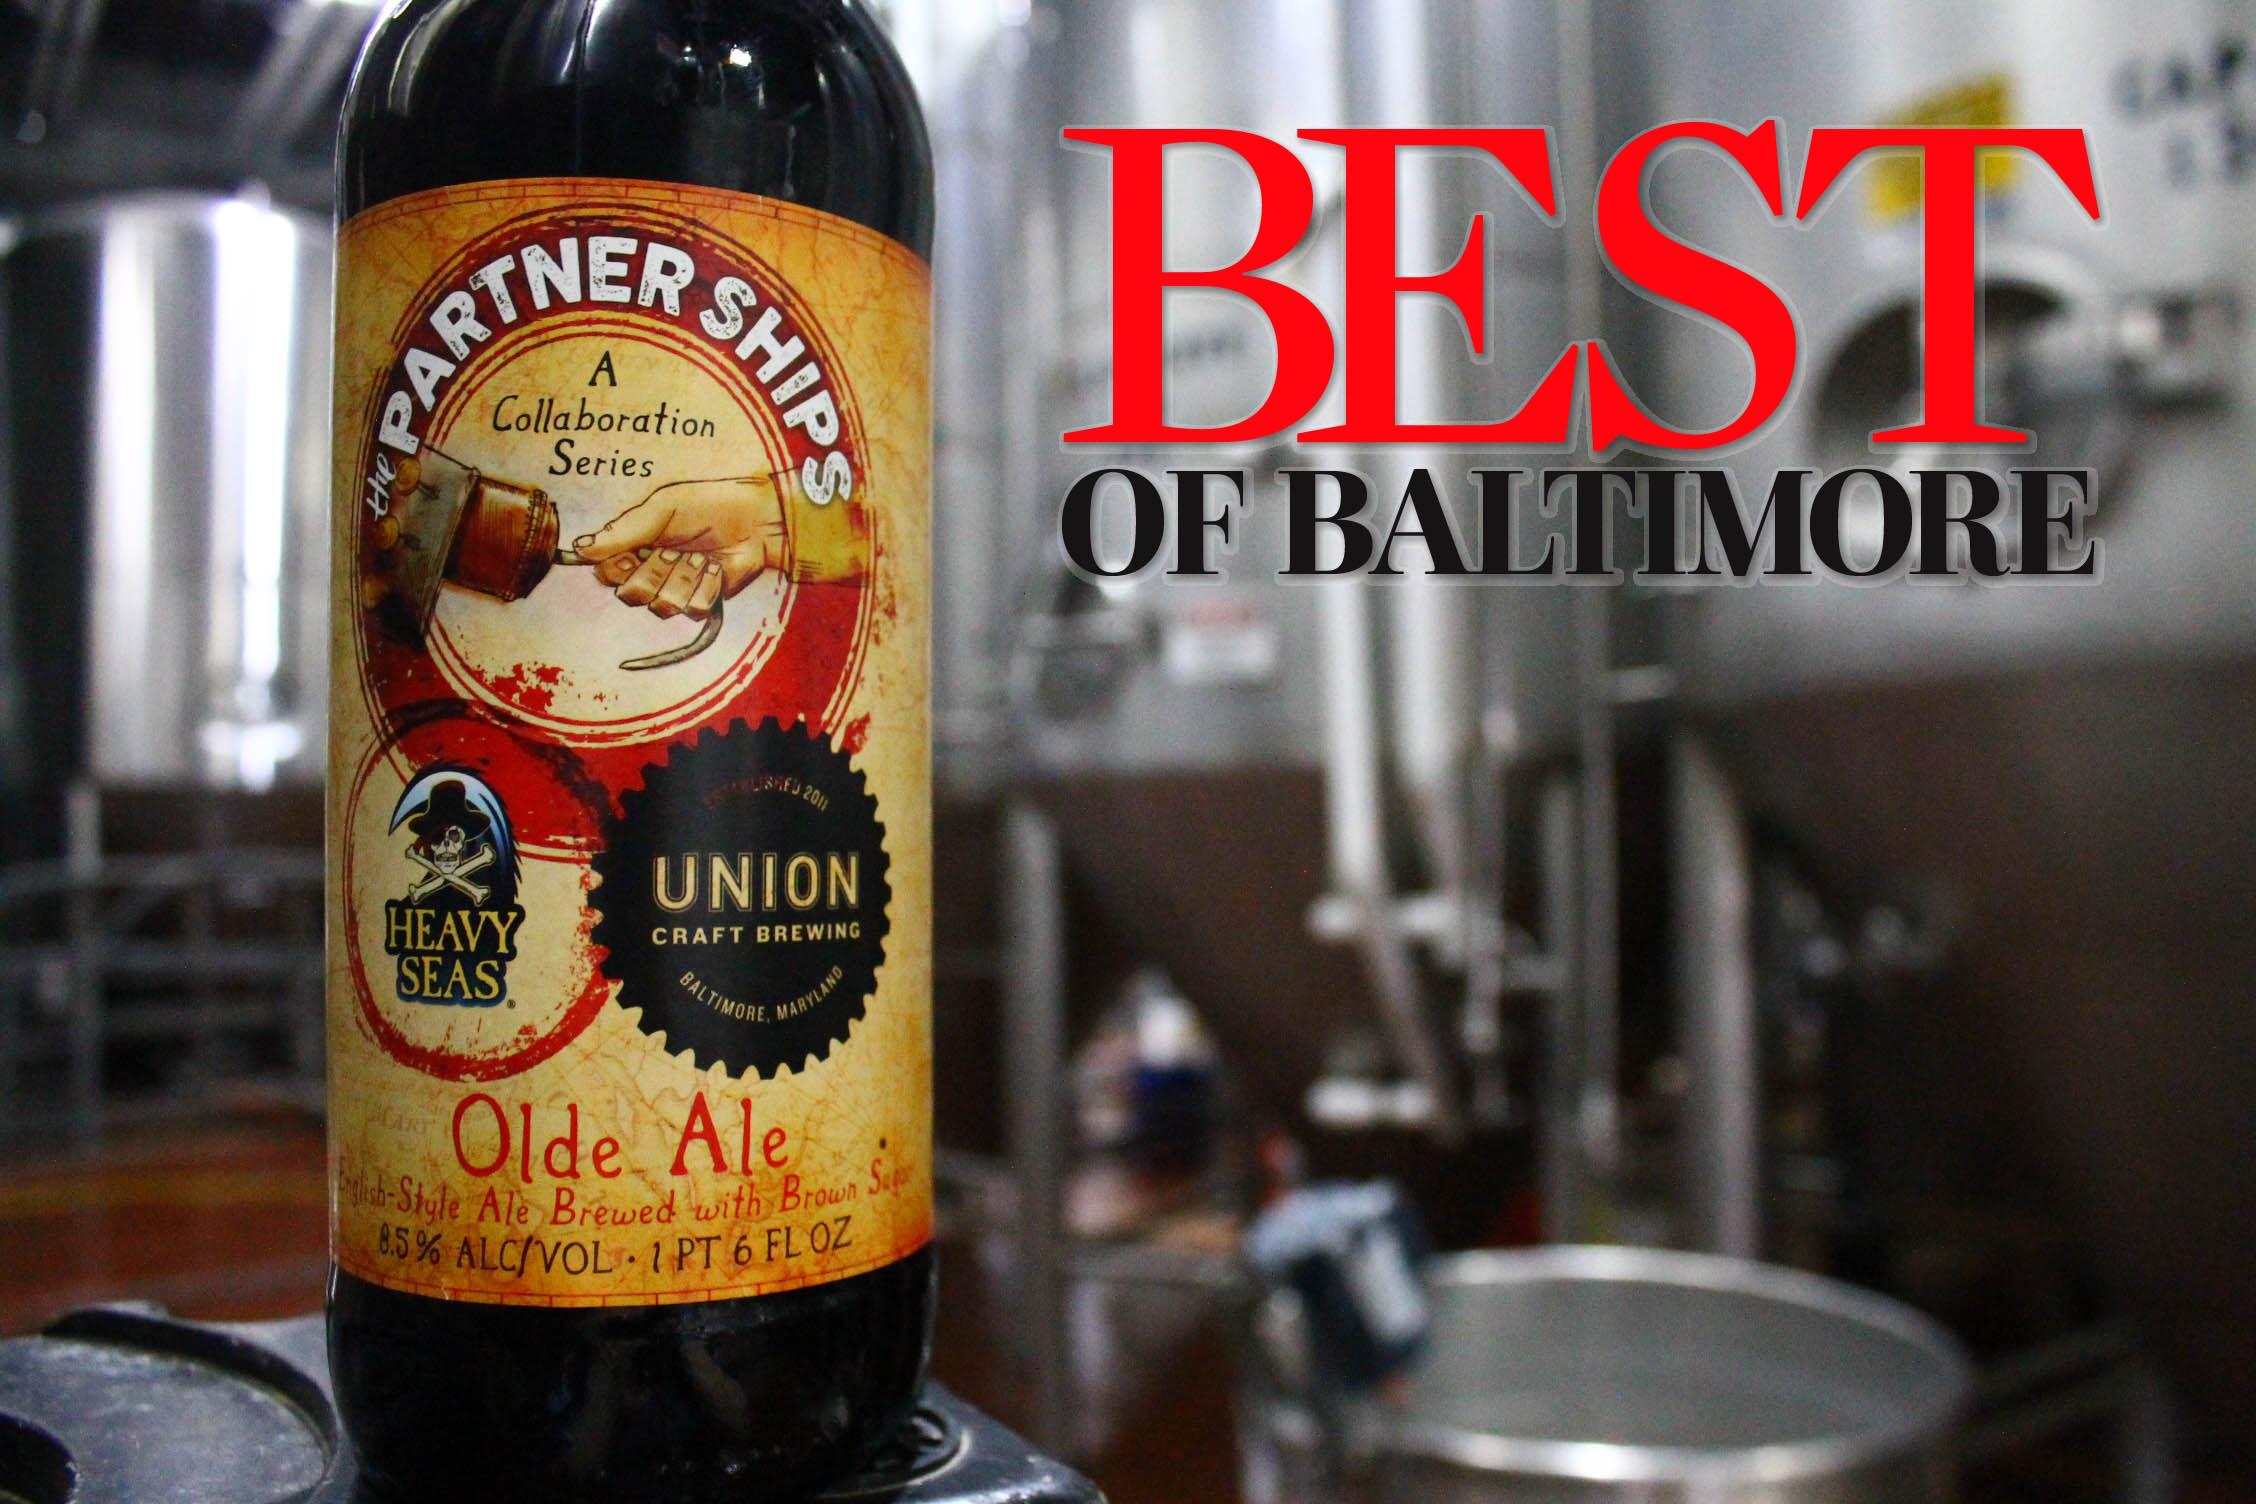 PartnerShips: Olde Ale - Heavy Seas & Union Craft Brewing